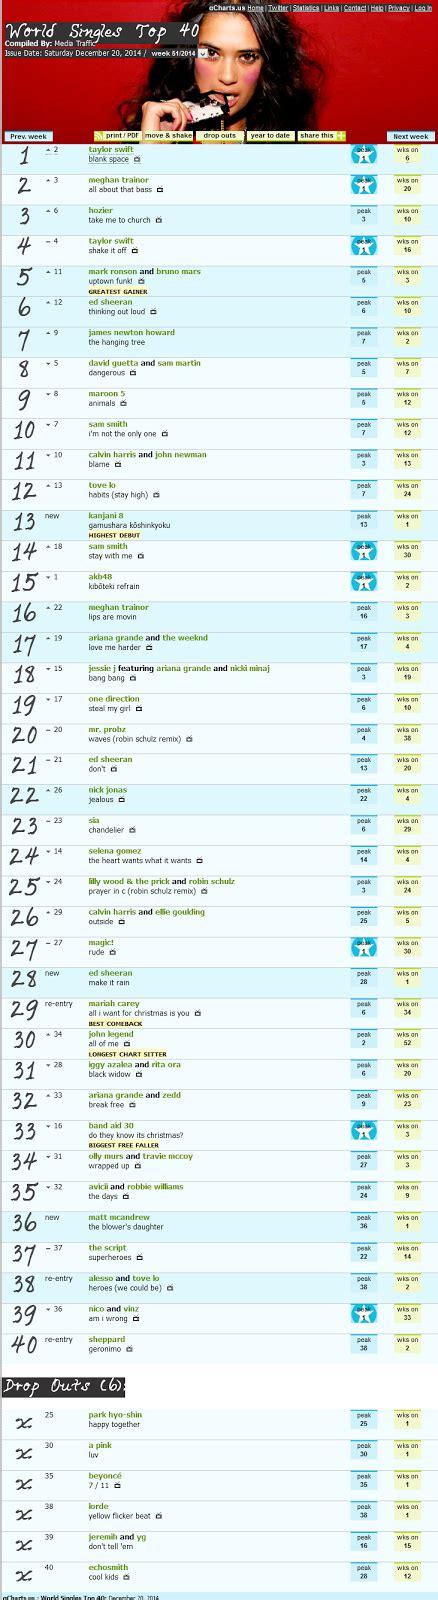 download mp3 top chart barat 2014 โหลดเพลงฟร vire mp3 ใหม 2016 mp3 top chart world